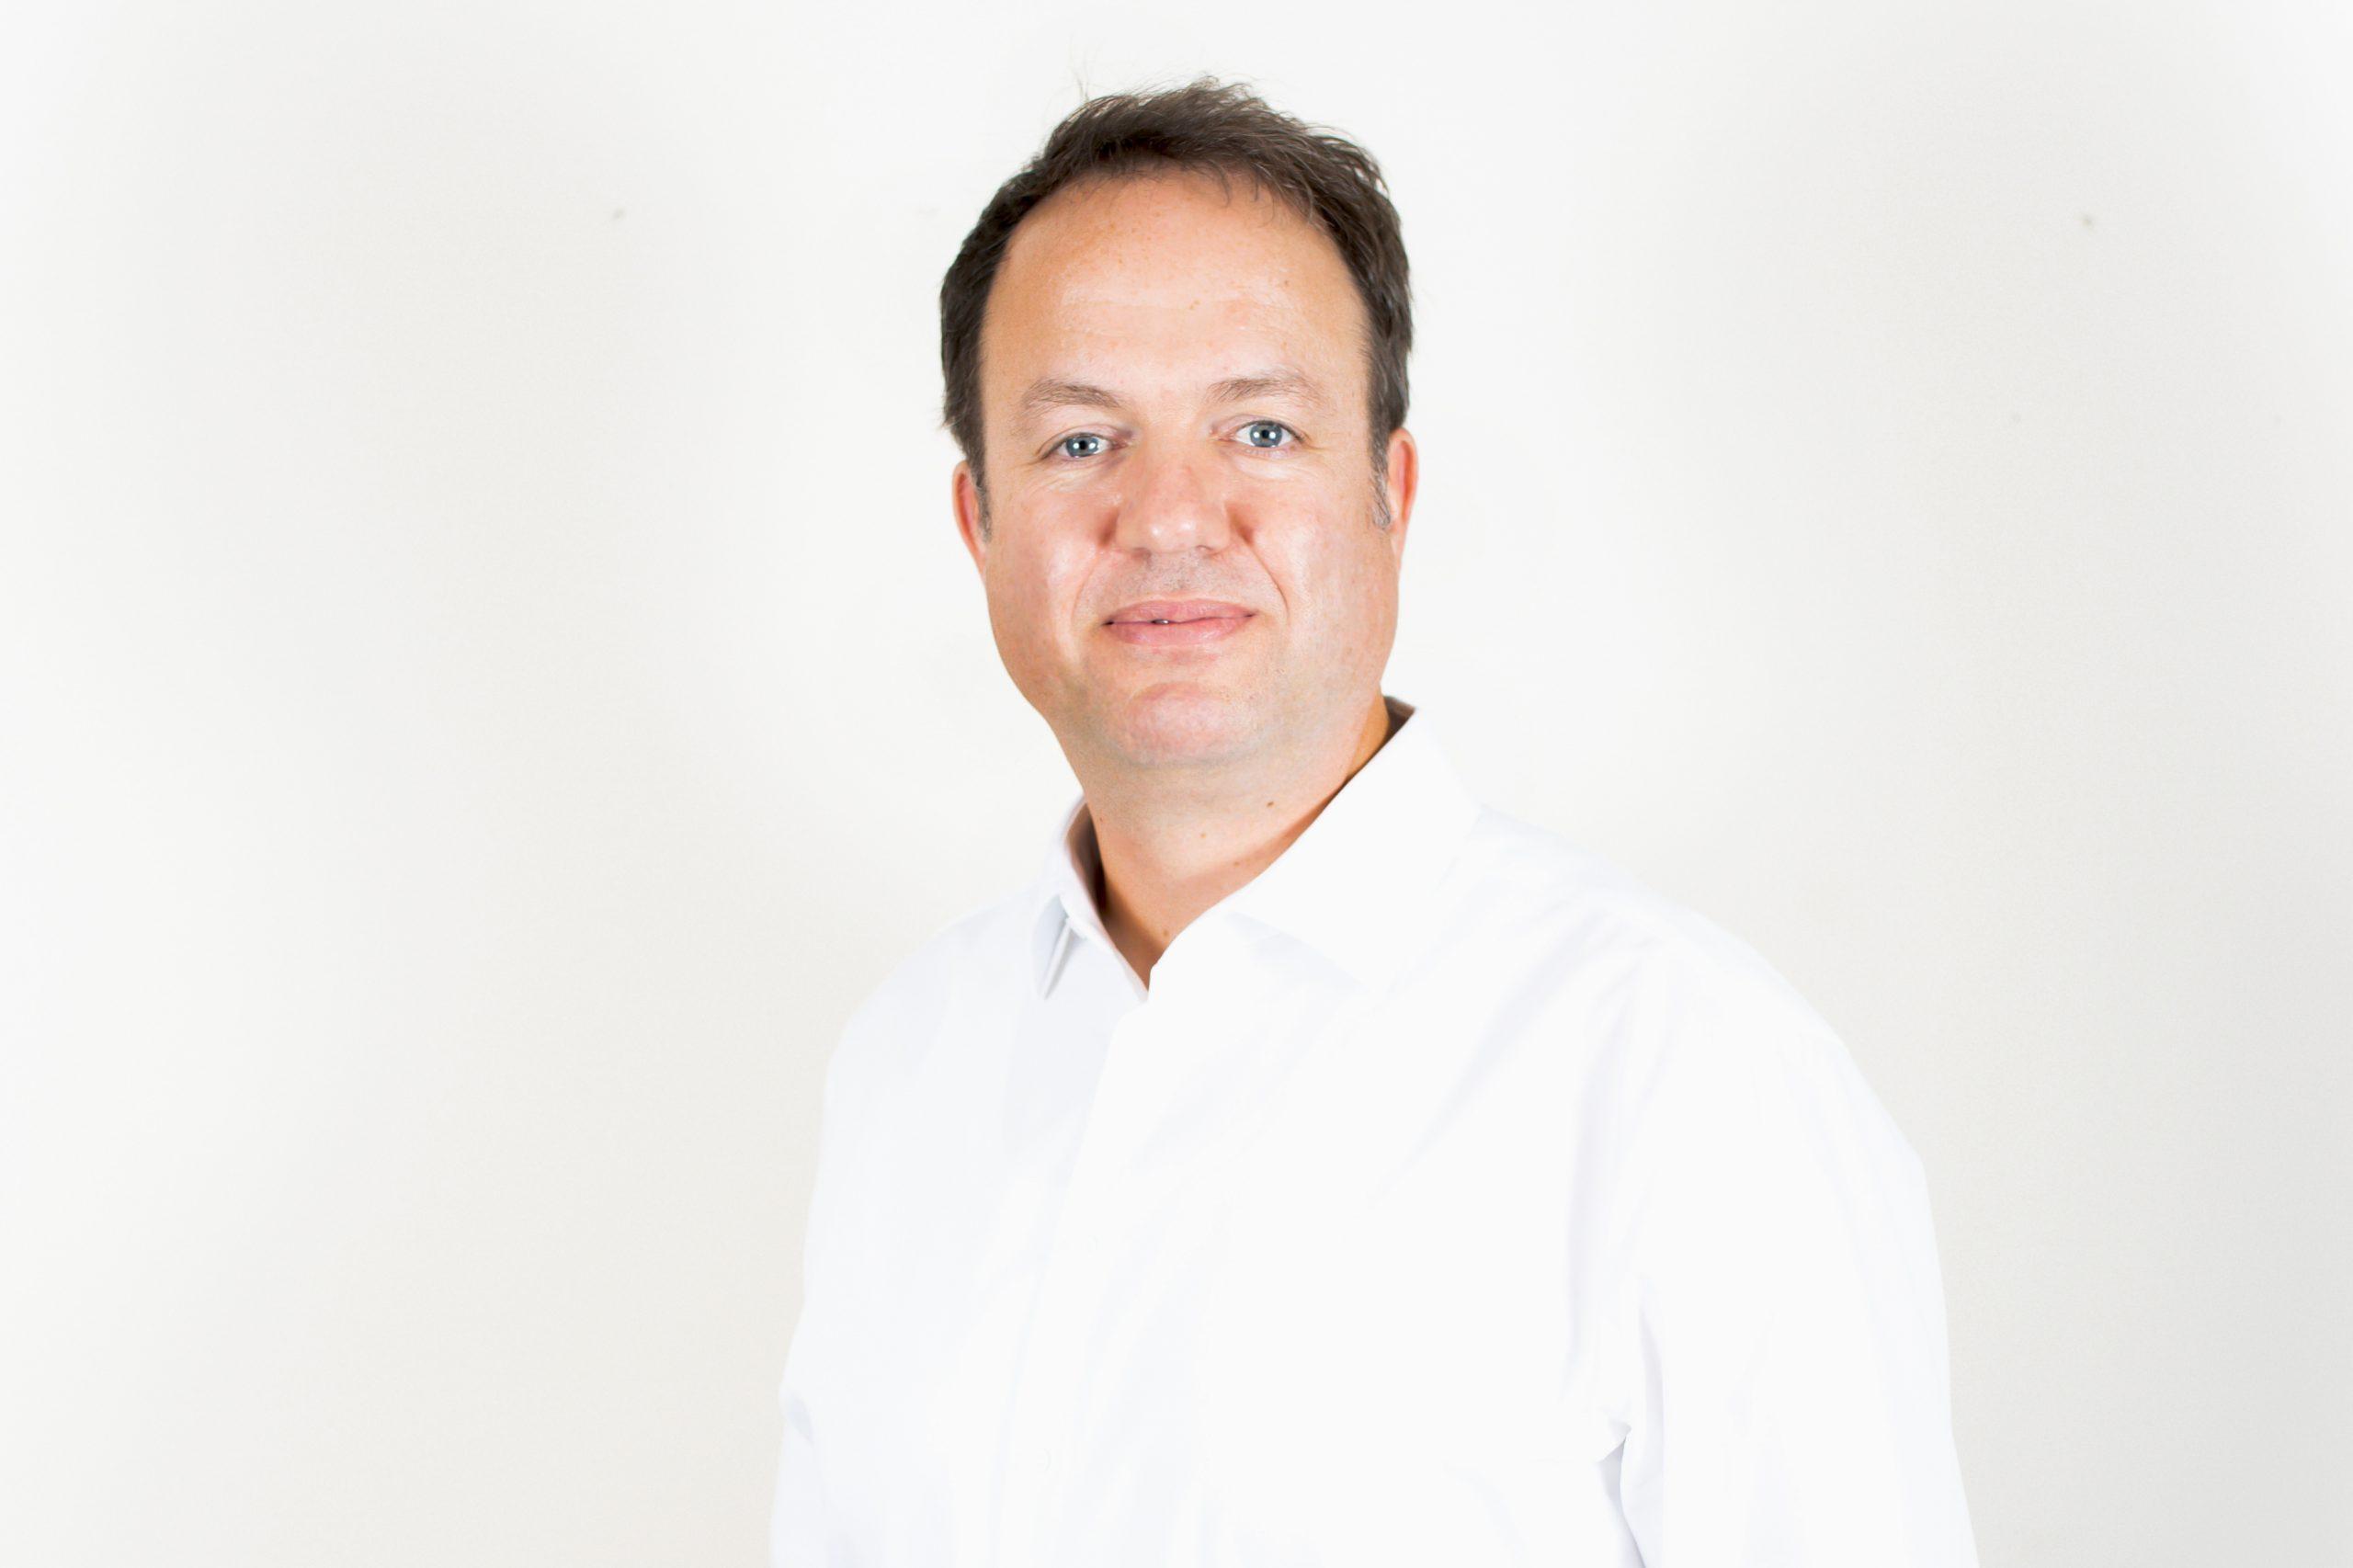 Augenarzt Dr. med. Matthias Müller-Holz - Augenzentrum Dresden